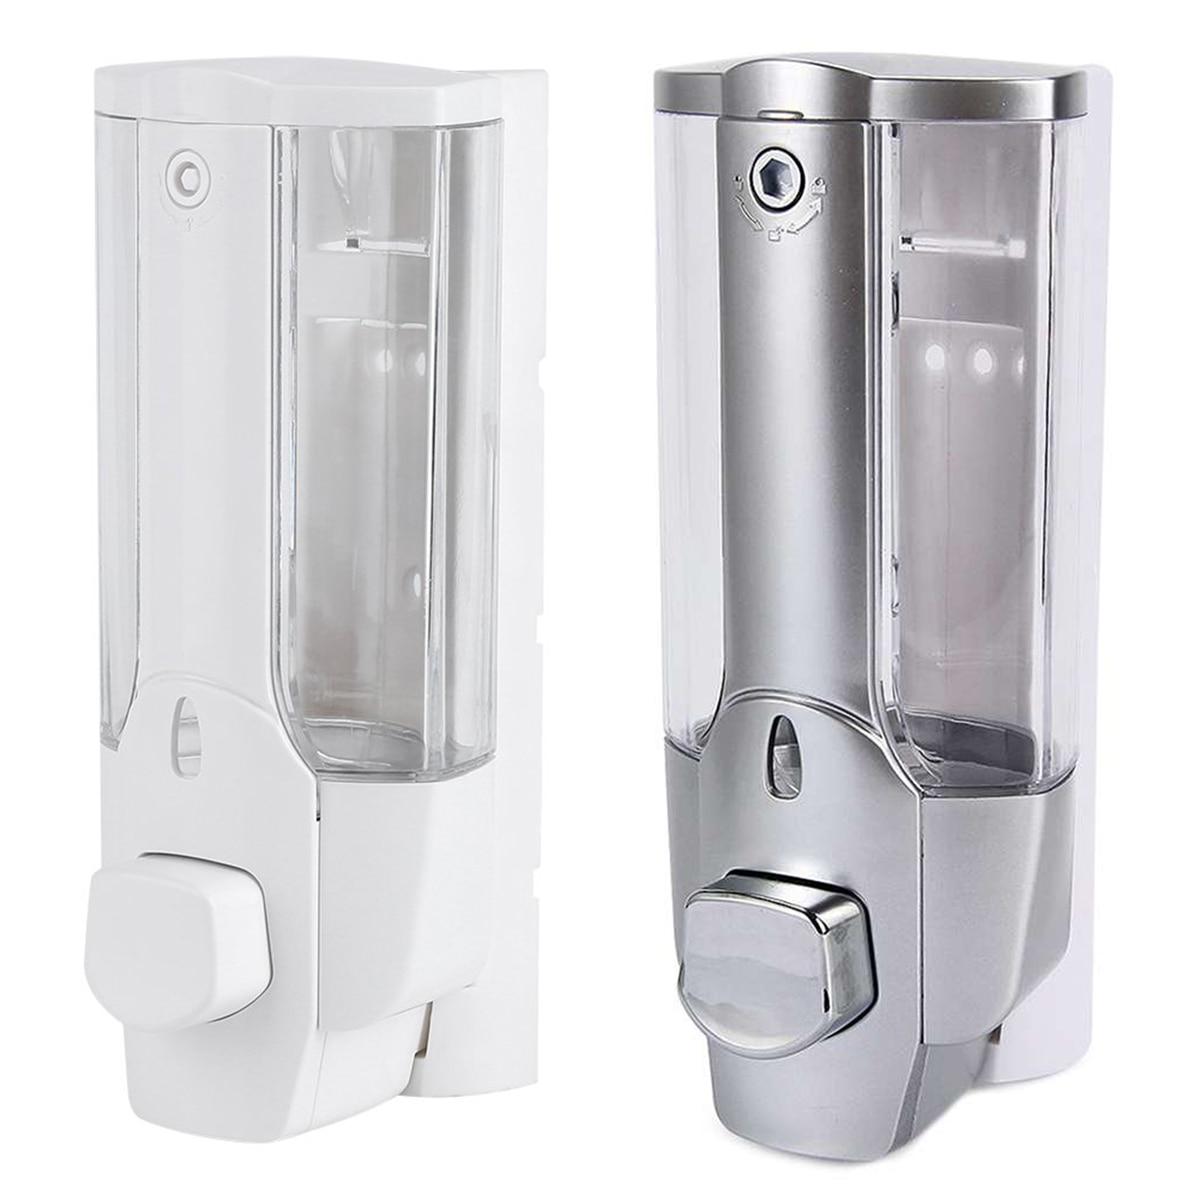 350ml Kitchen Bathroom Wall Mounted Liquid Soap Dispenser Bathroom Hand Sanitizer Dispenser Shower Gel Shampoo Containers